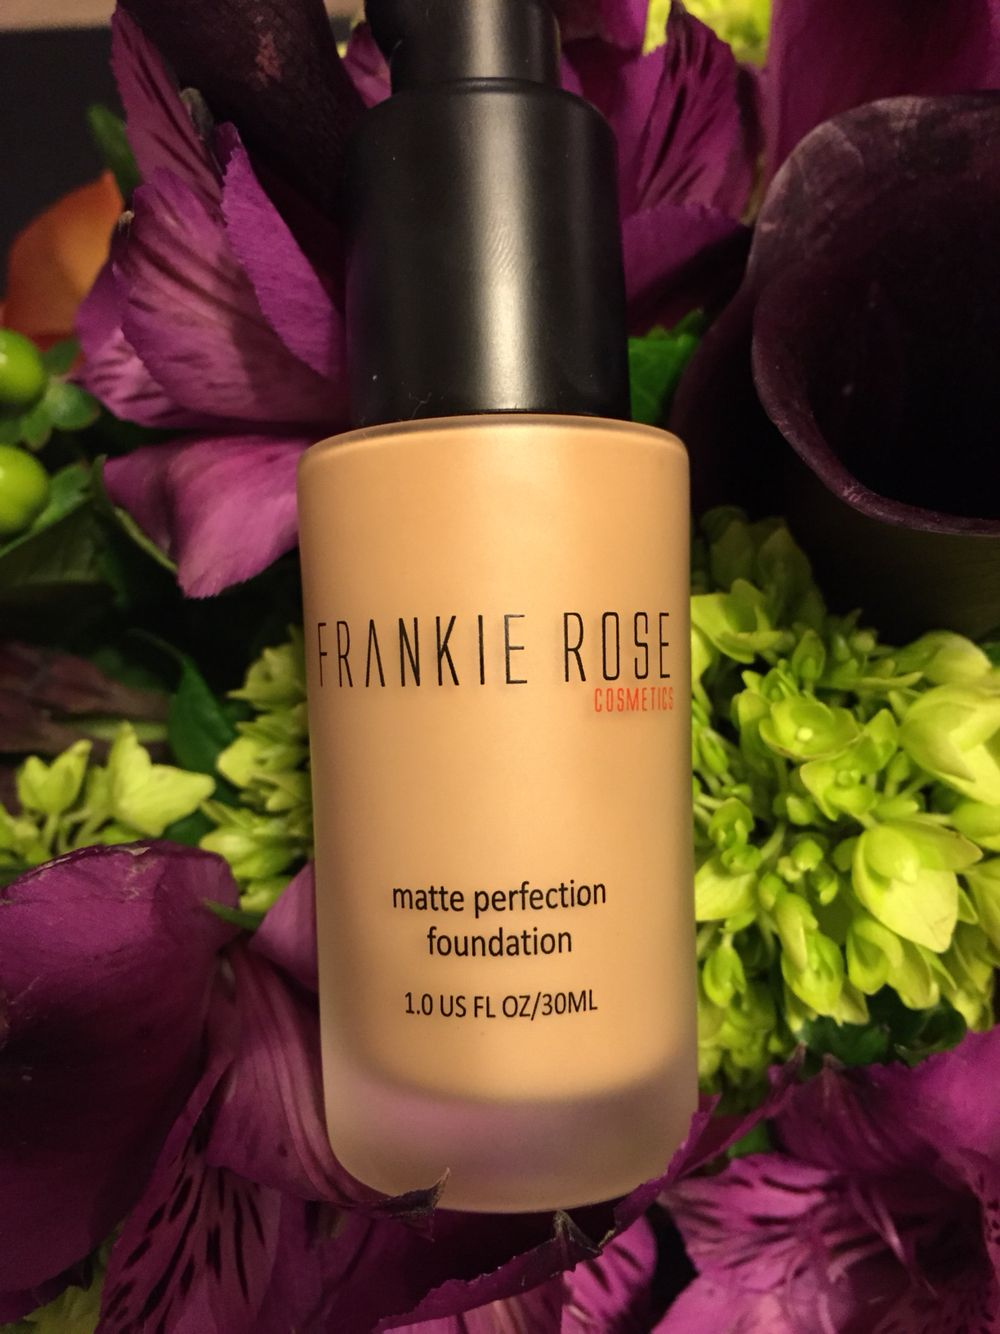 Frankie Rose Foundation Makeup skin care, Frankie